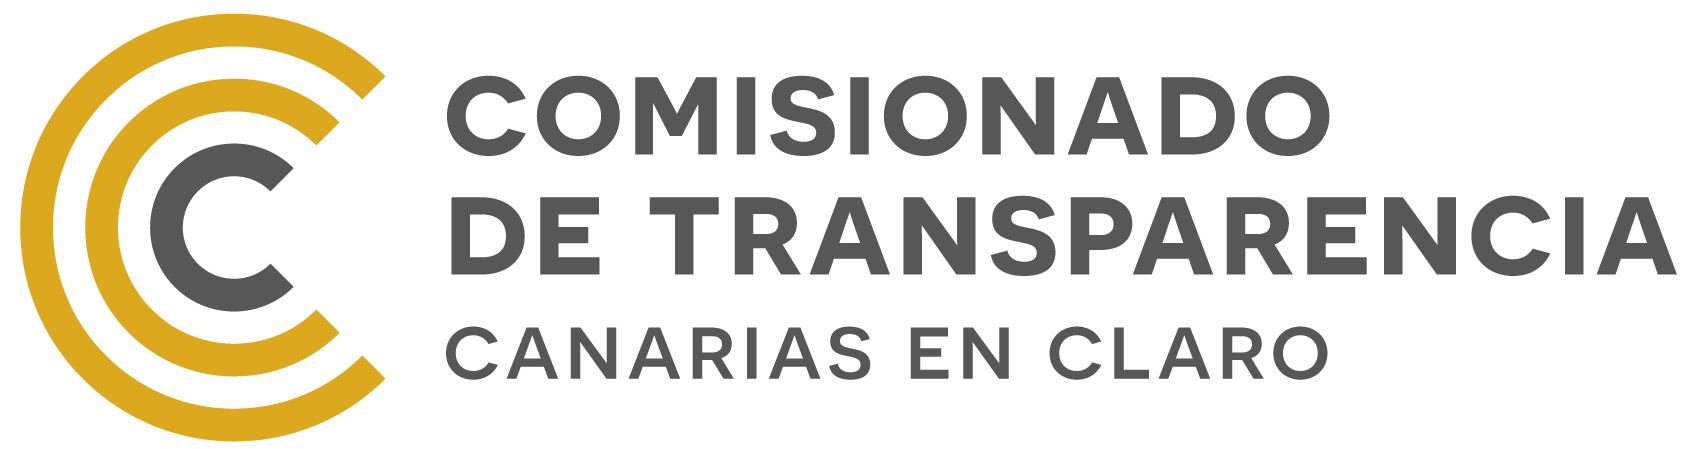 Portal de Transparencia cropped-CTRANS-MARCA-2.1-01-FT-3